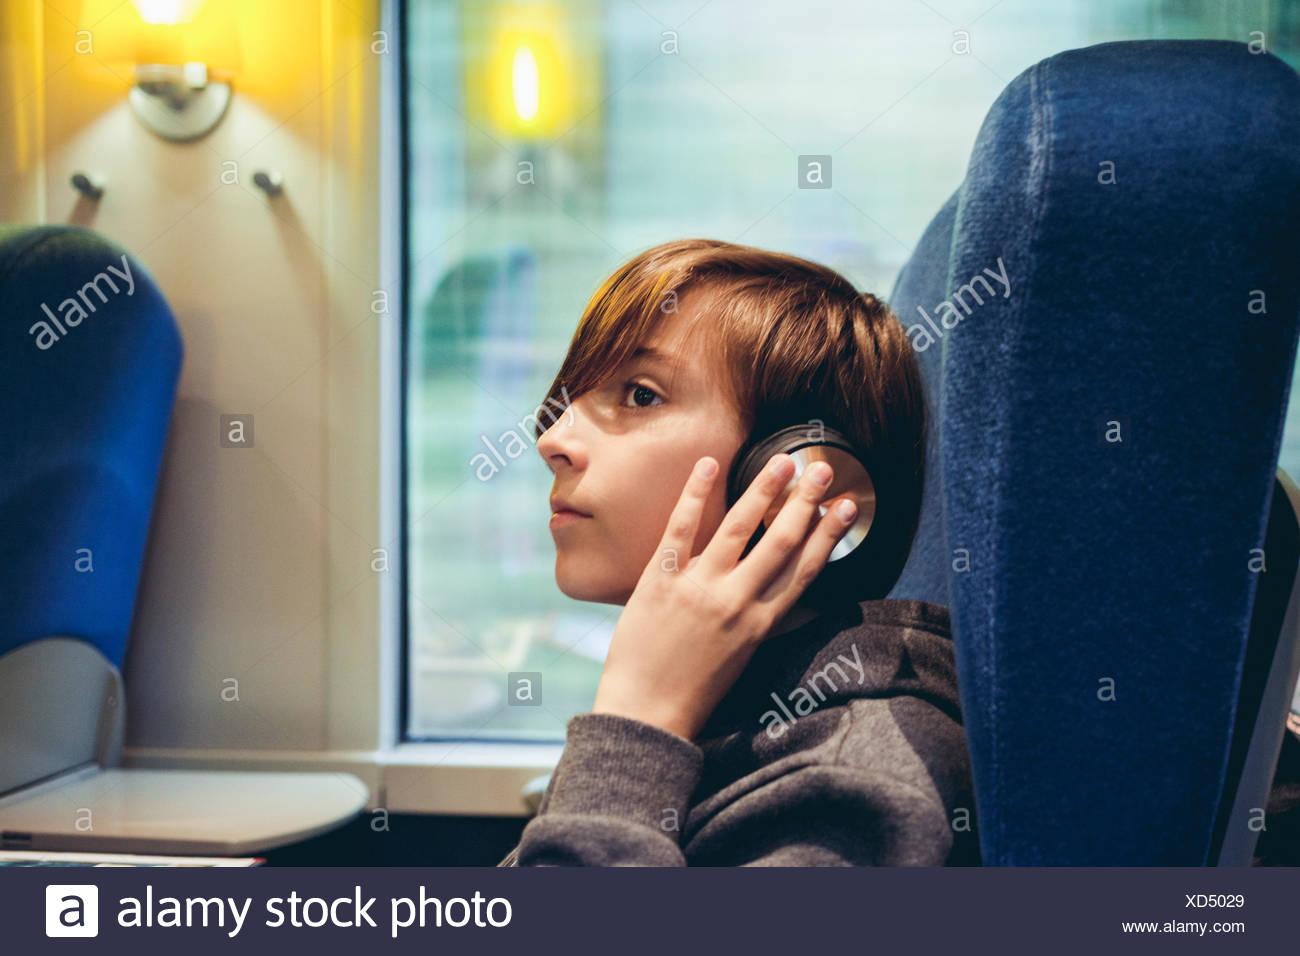 Boy listening to music - Stock Image